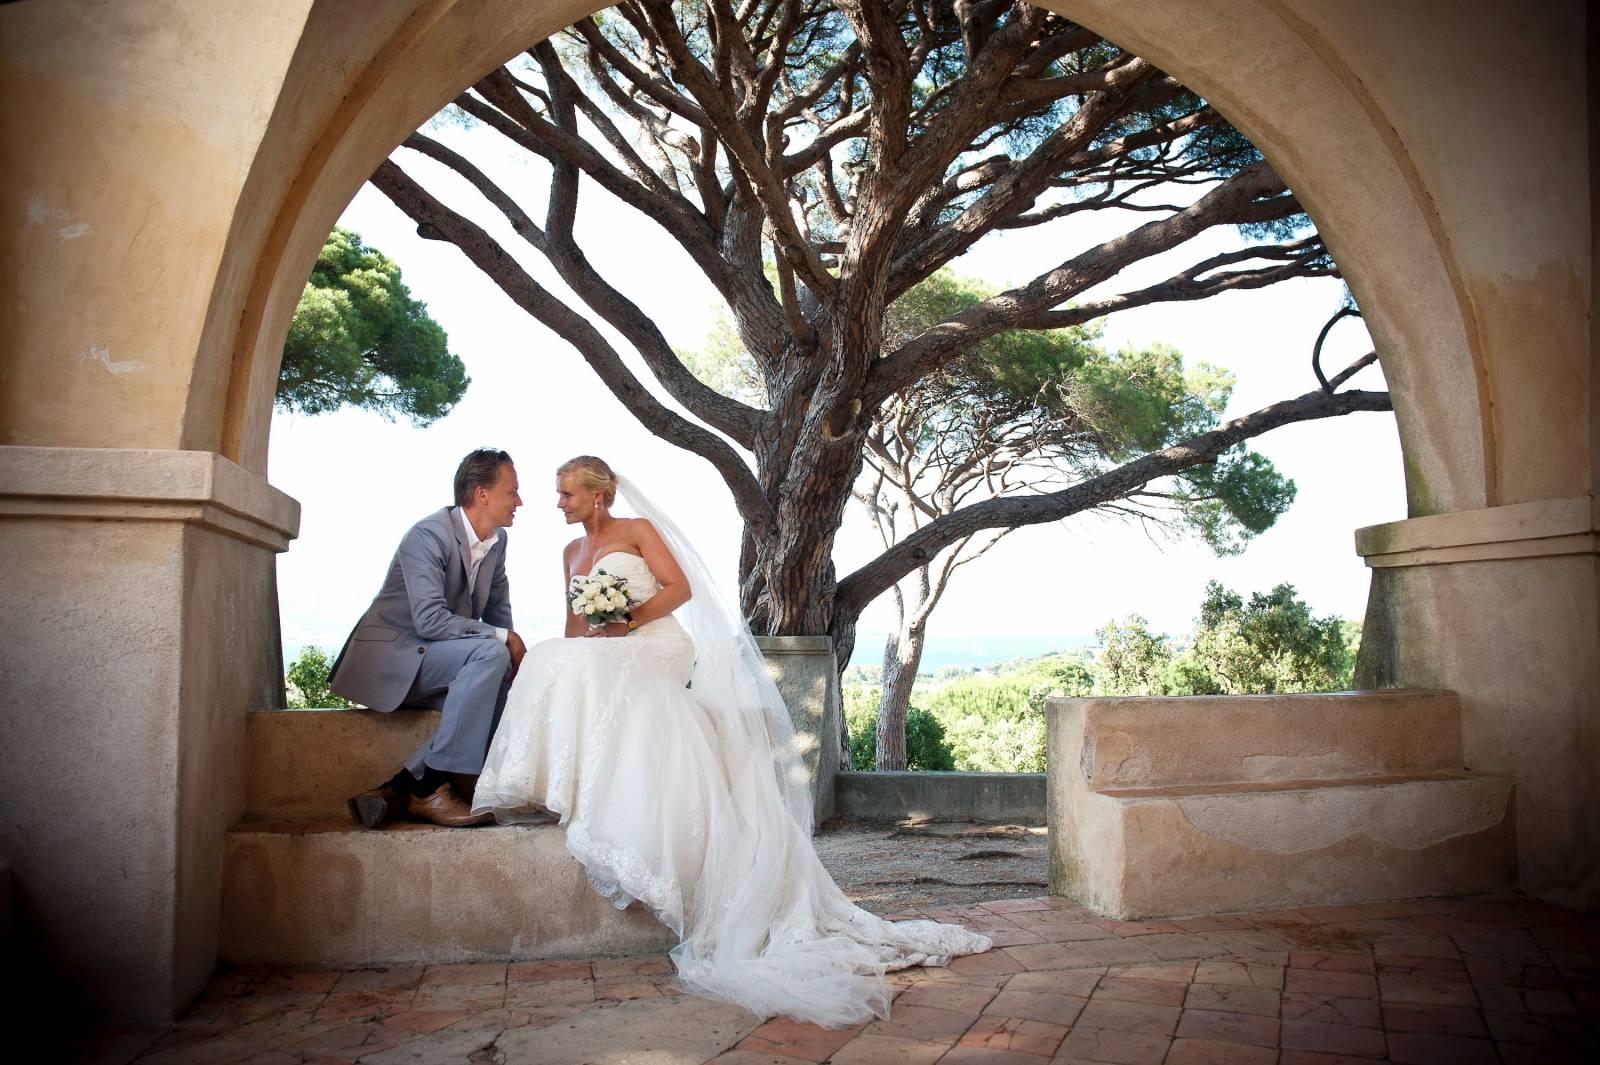 Foto Meeuw - House of Weddings - 3